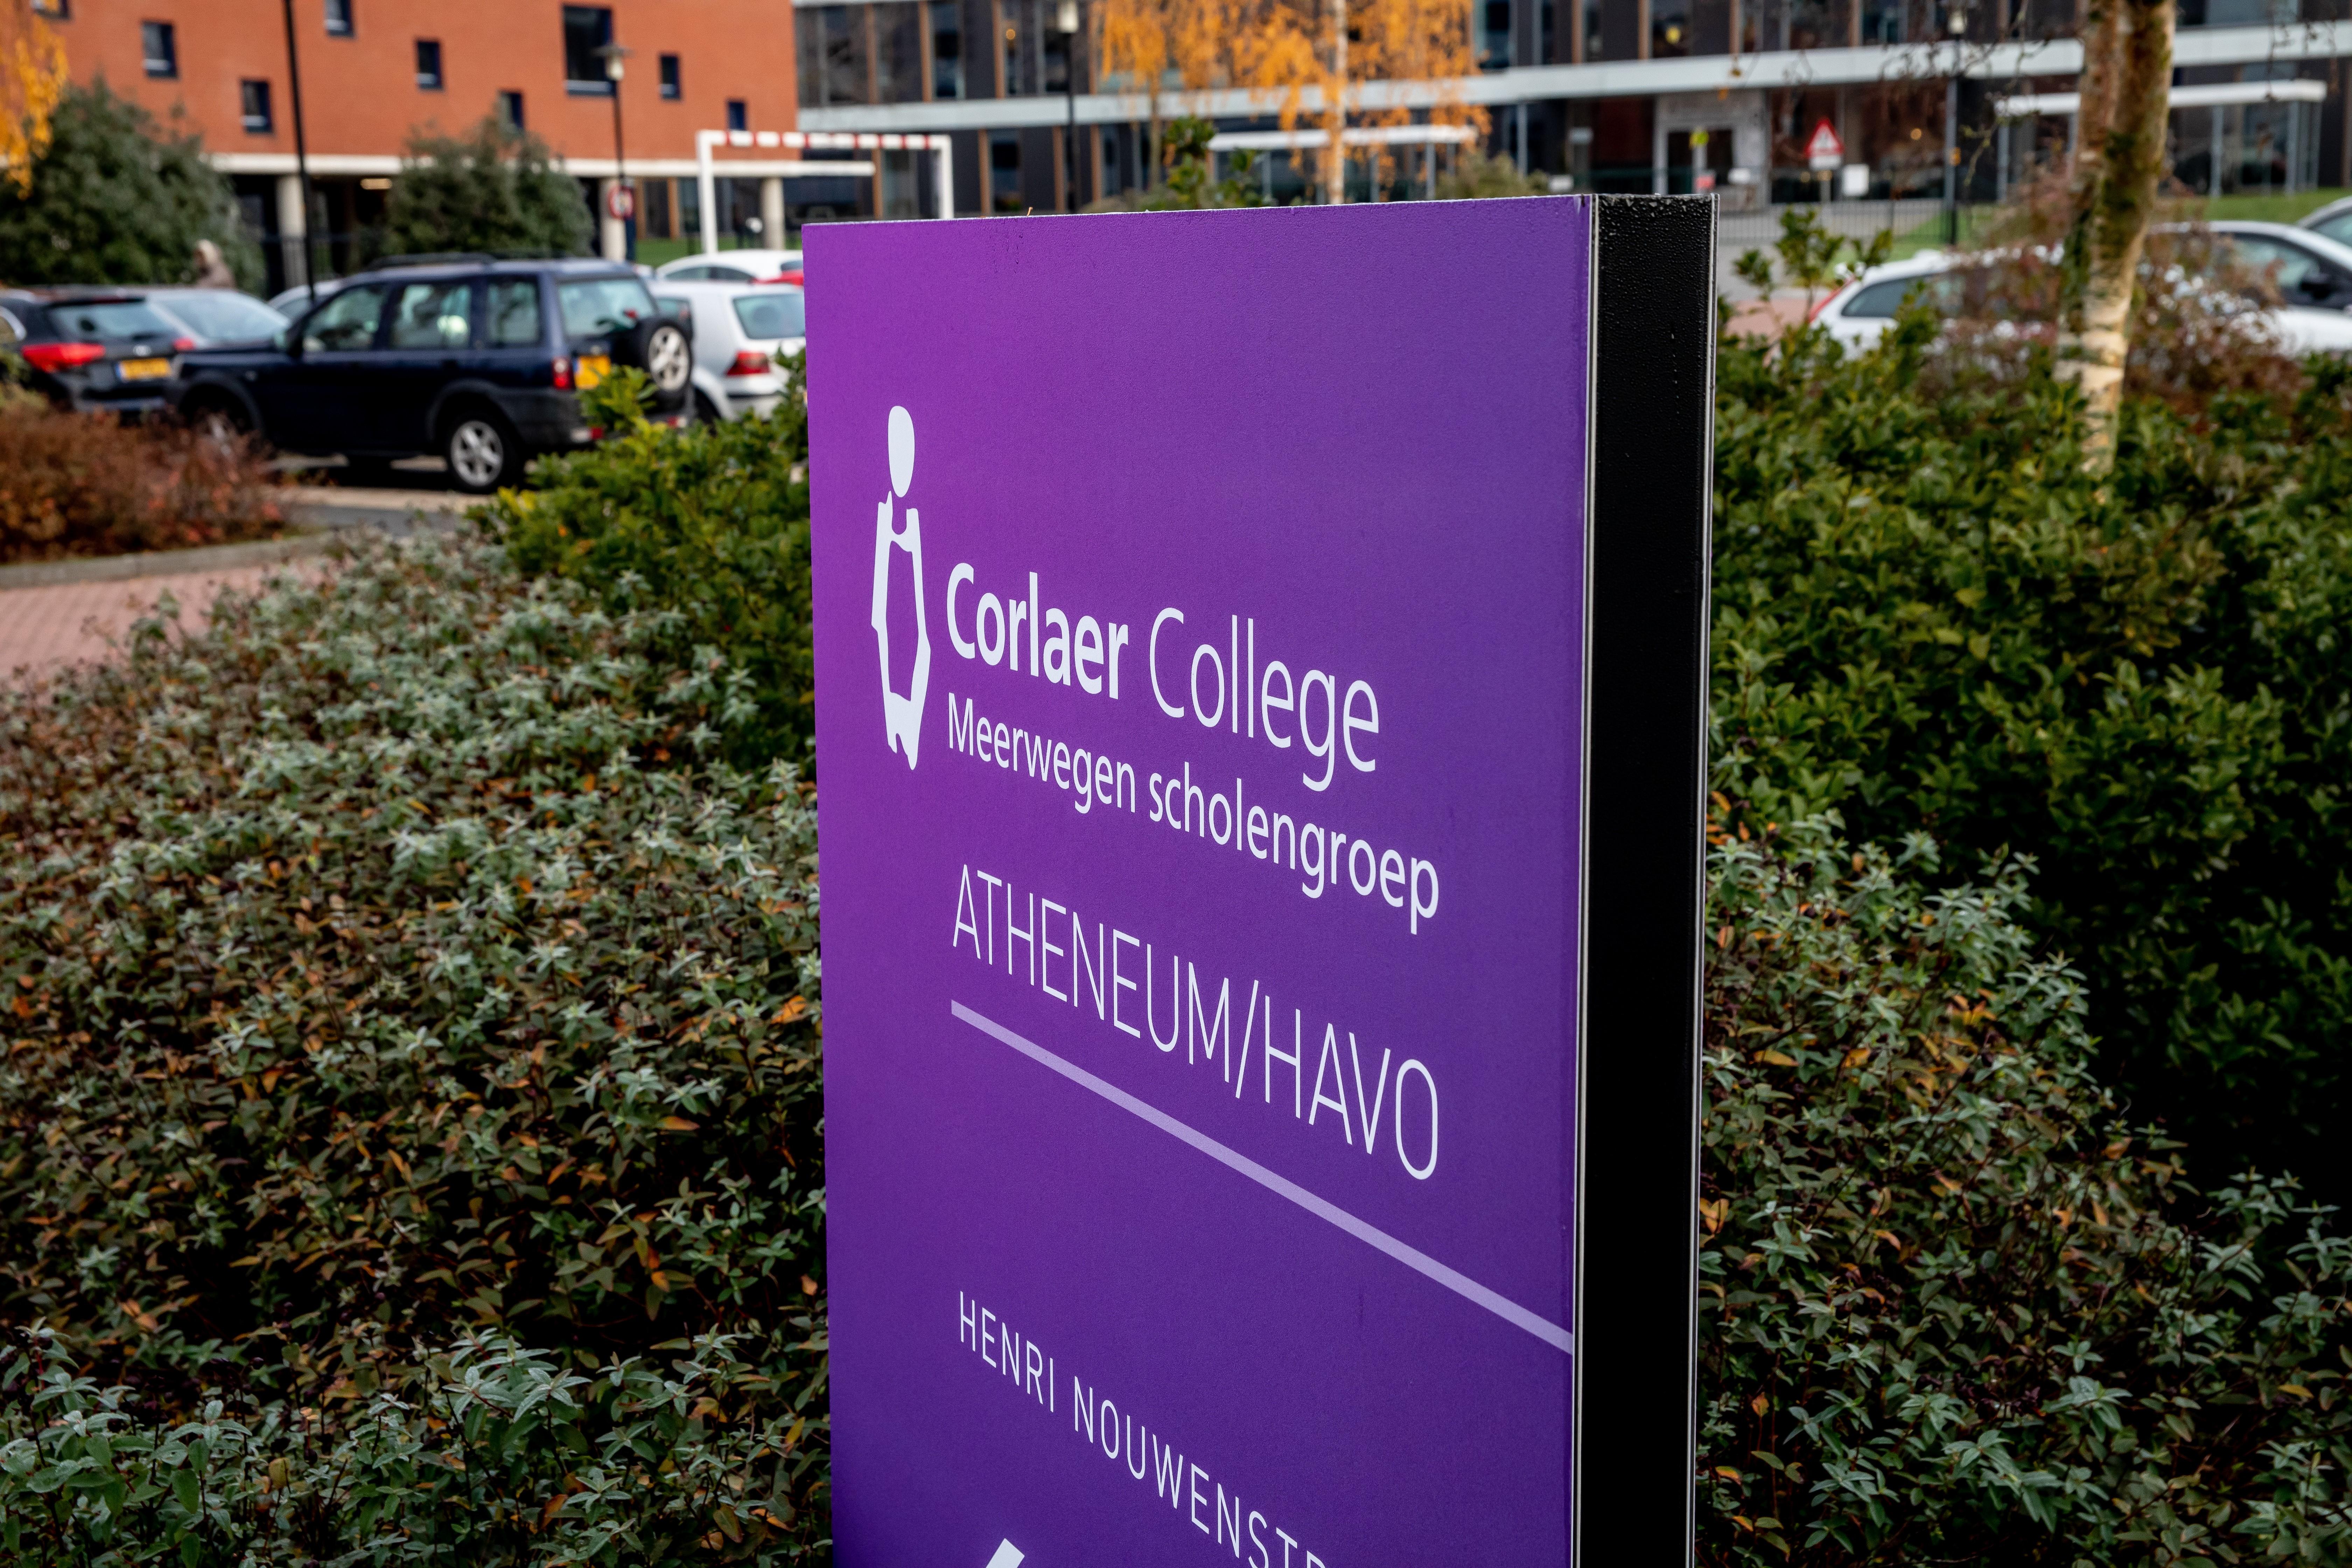 corlaer-college-reclamezuil